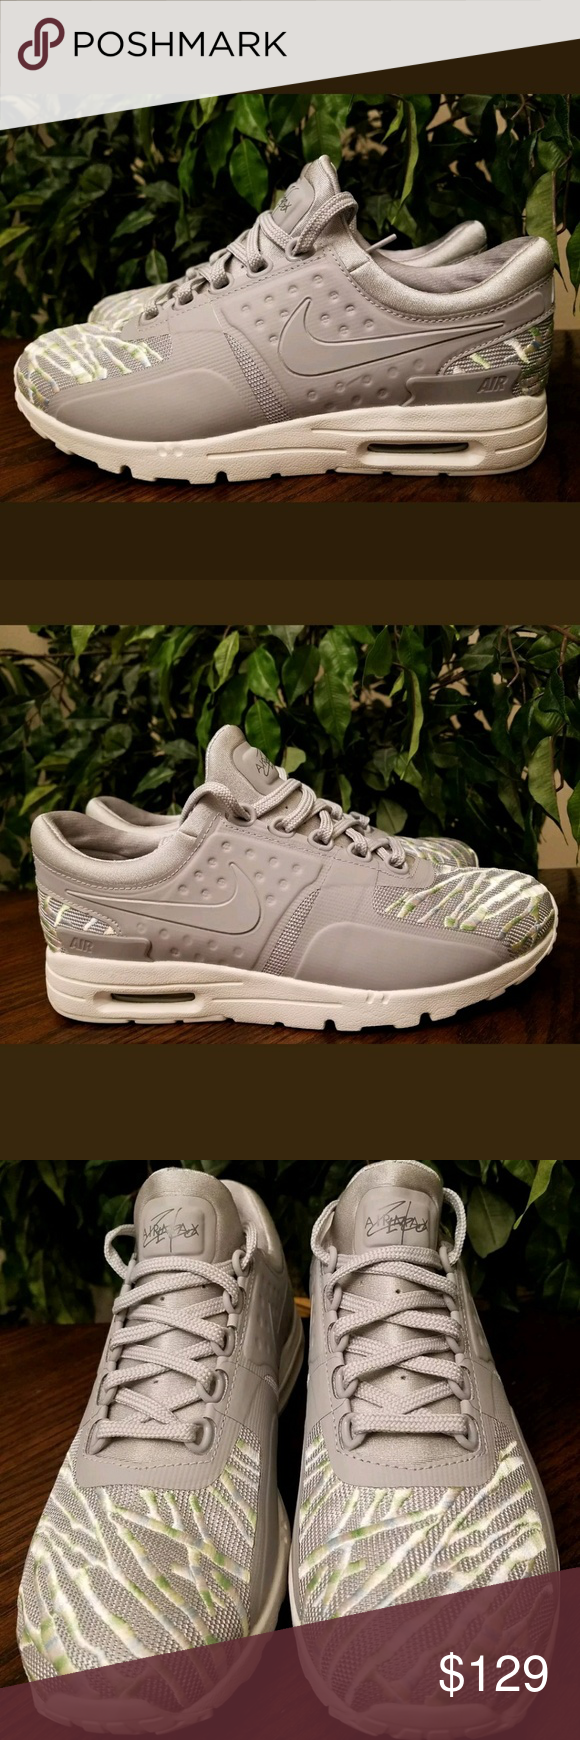 5bdf4520a50 Nike Women s Air Max Zero SE Sneakers 896199 001 Nike Women s Air Max Zero  SE Sneakers 896199 001 Size 7 Color  Grey Rainbow Nike Shoes Athletic Shoes